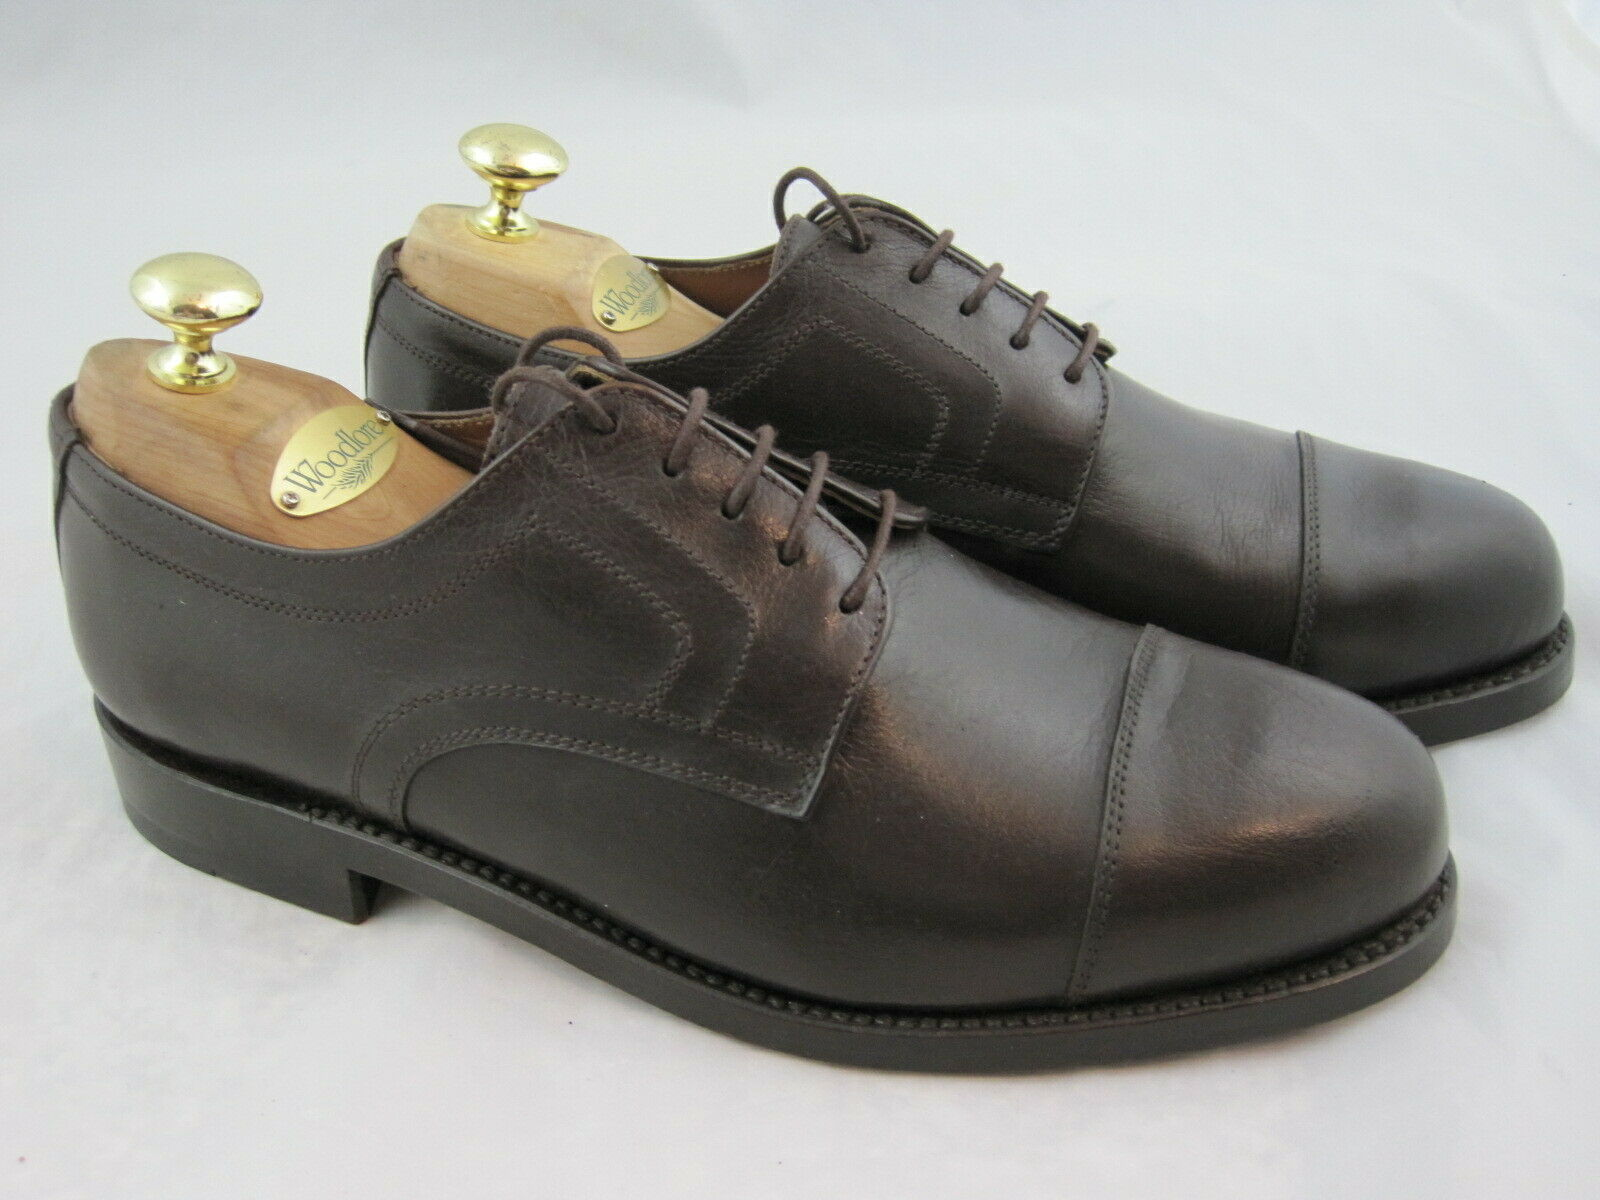 Prime chaussures (Handmade Goodyear Welted) chaussures hommes en 42 UK 8 neu